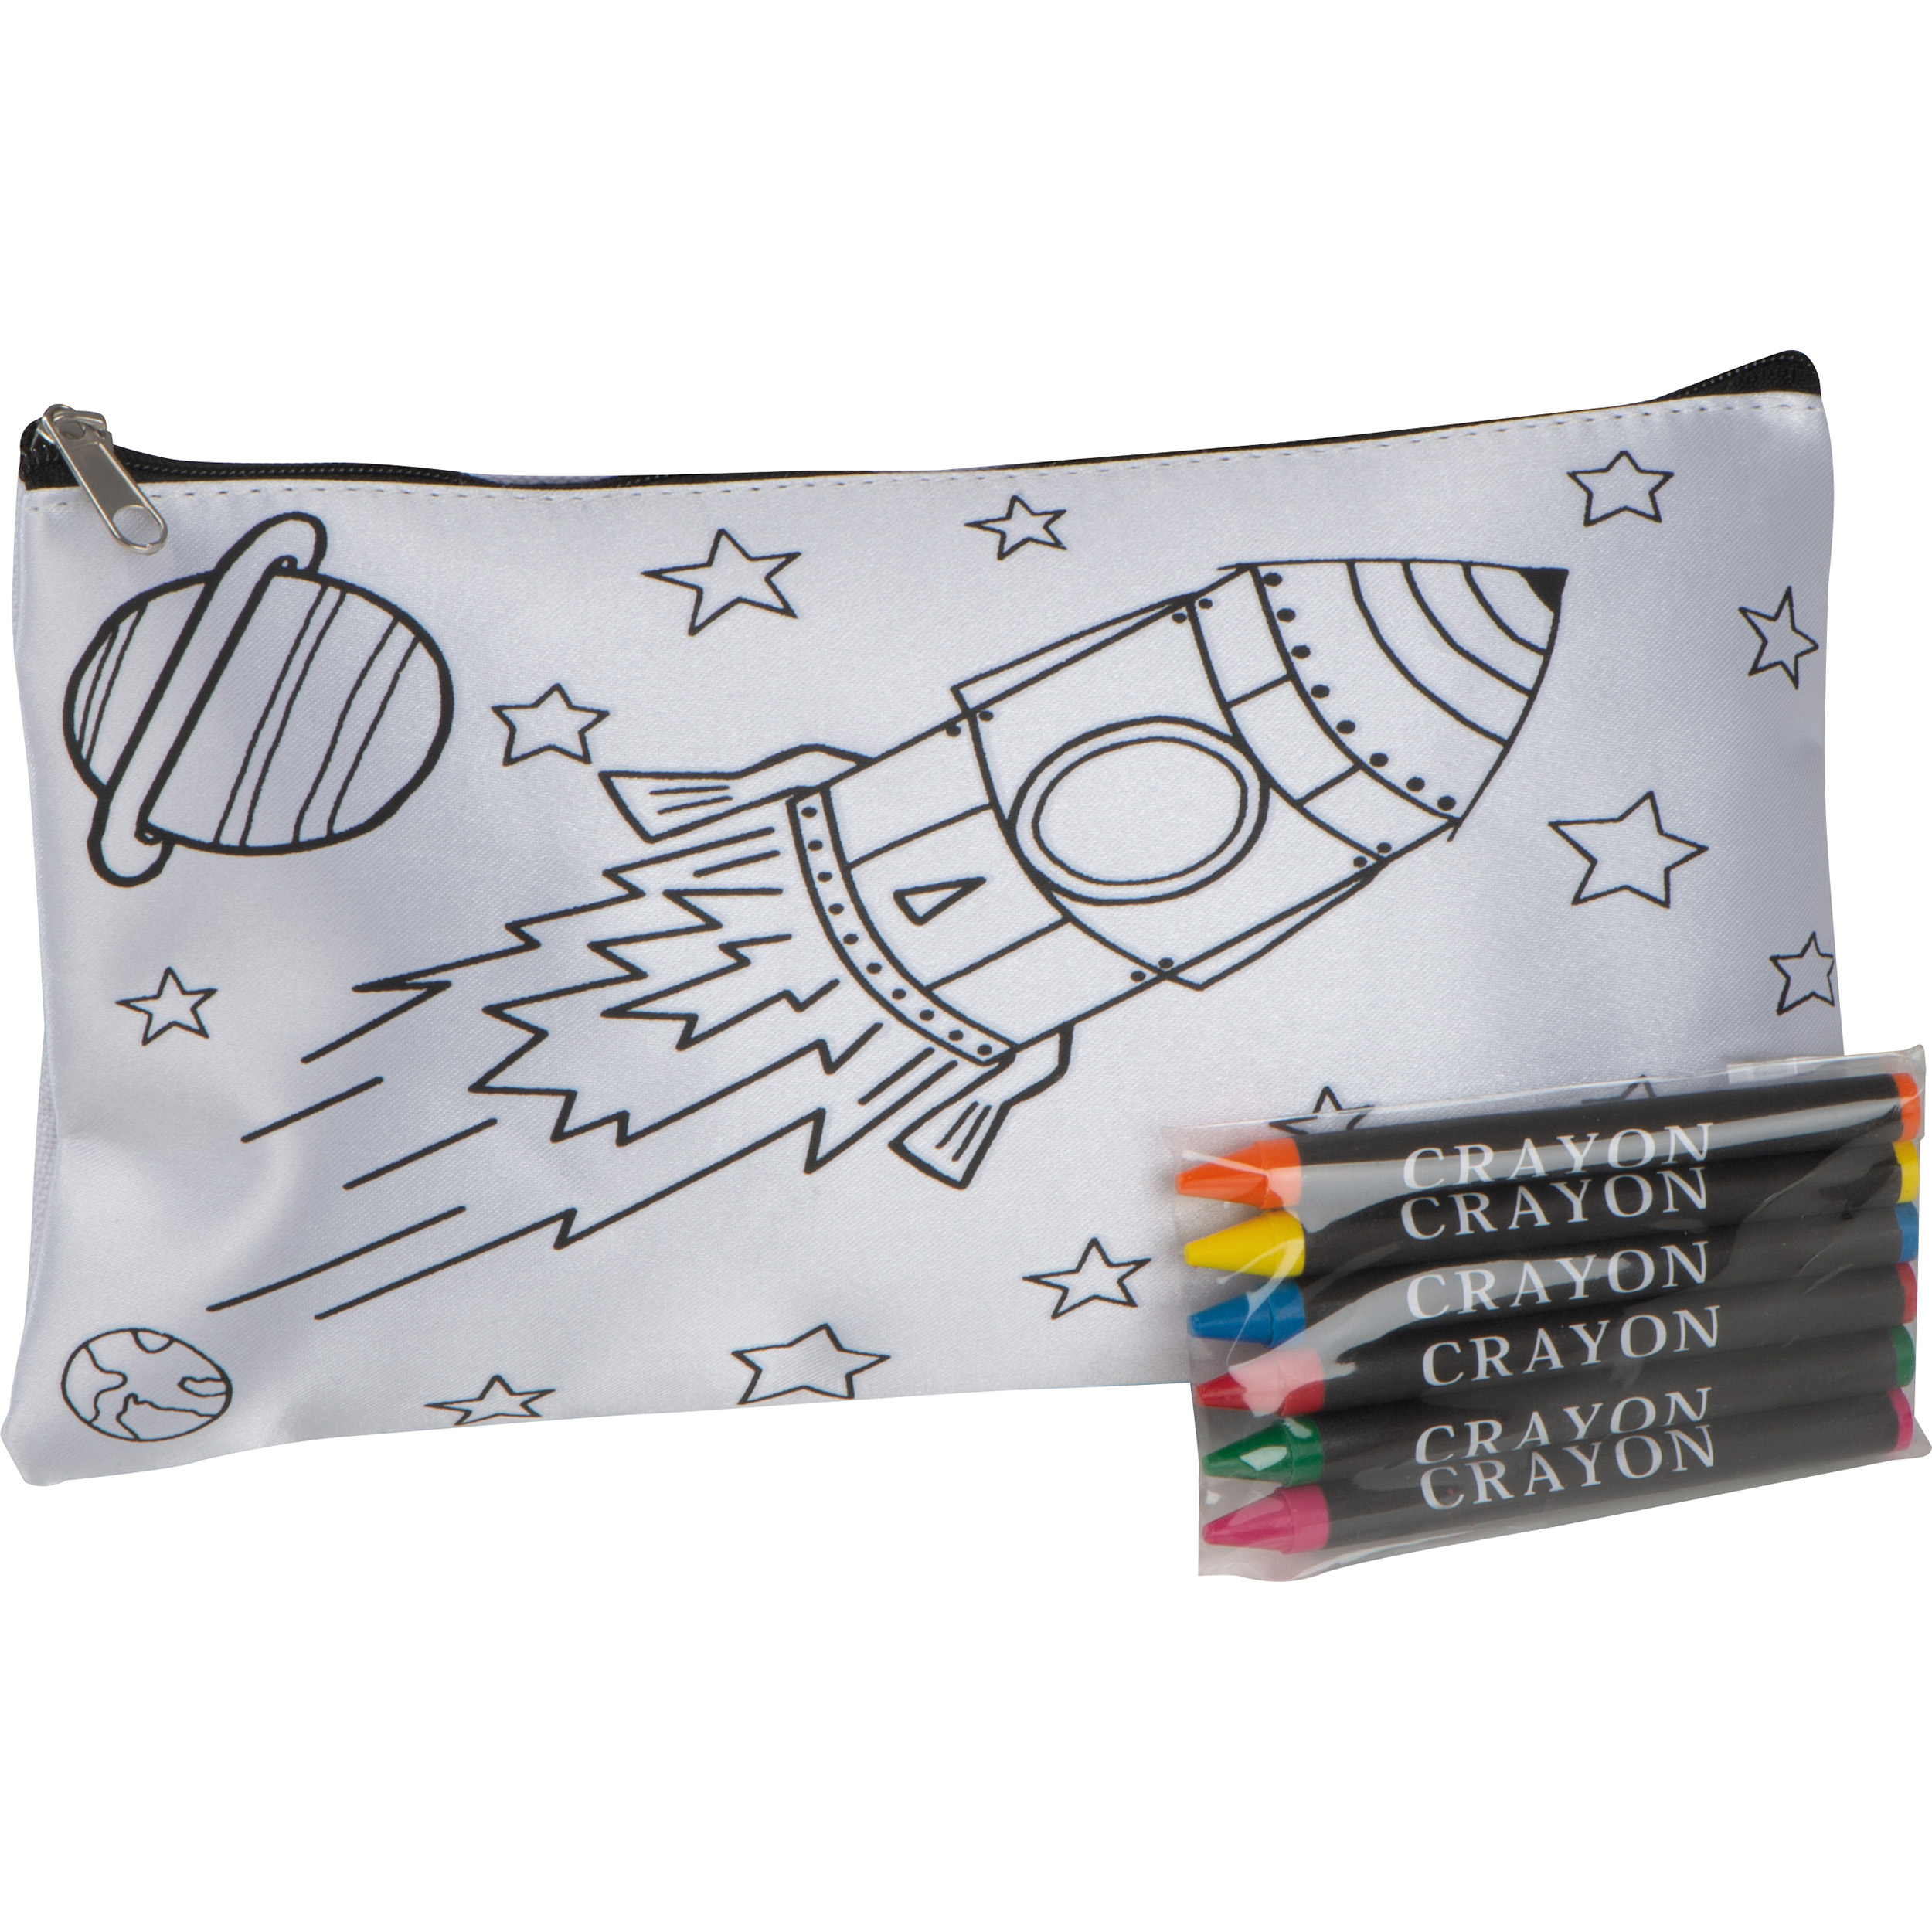 Pencil case for kids